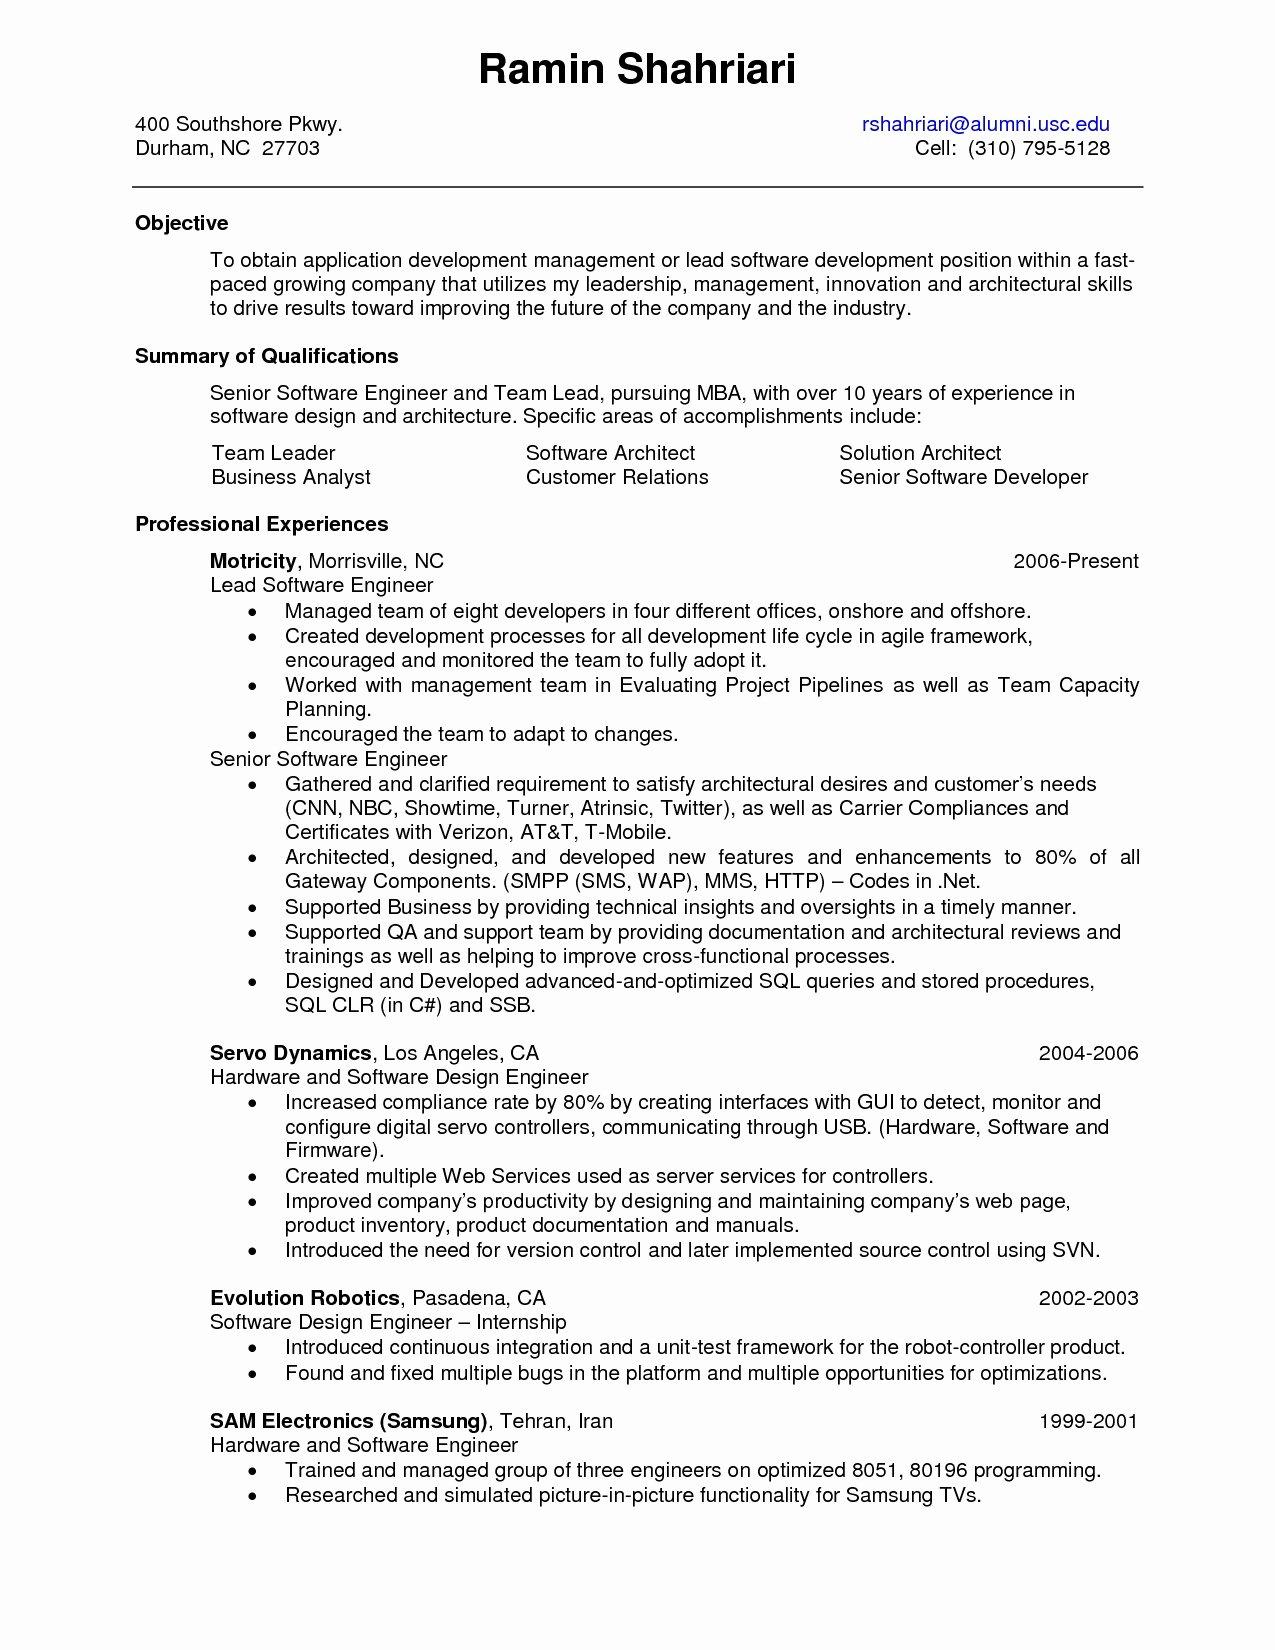 Quality Analyst Resume